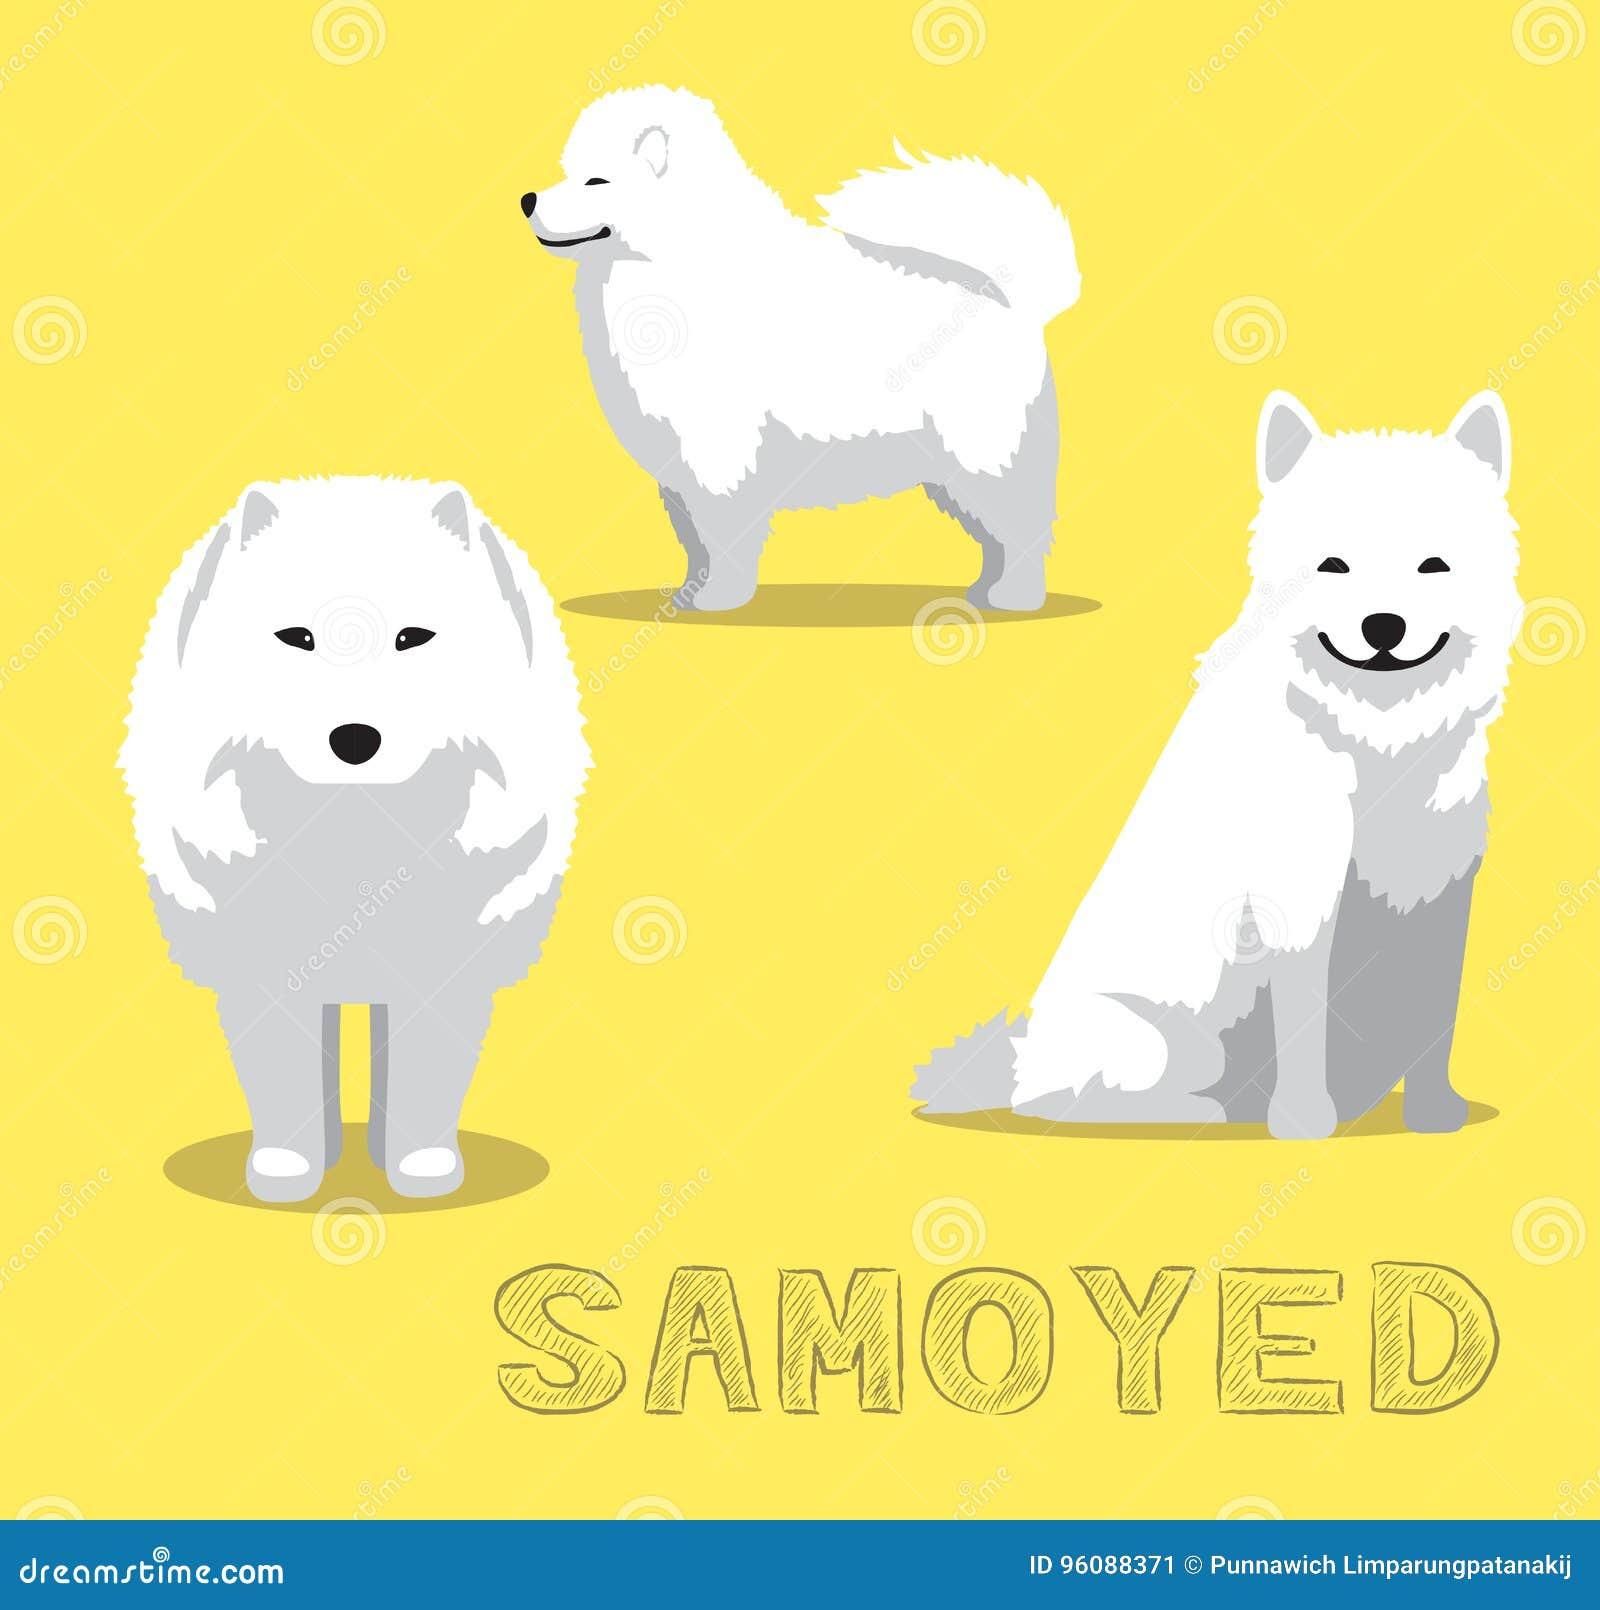 Dog Samoyed Cartoon Vector Illustration Stock Vector Illustration Of Siberia Cute 96088371